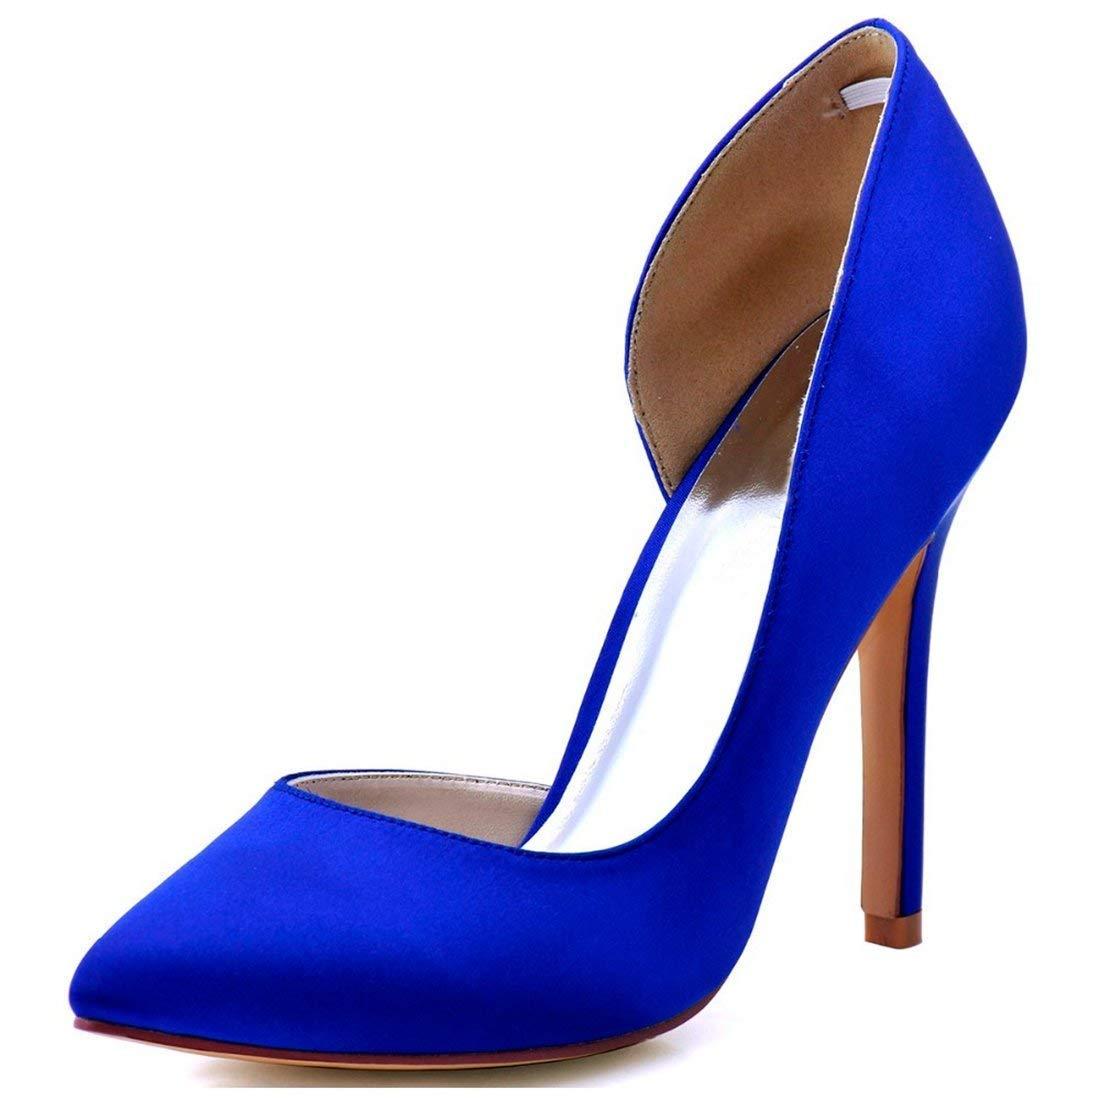 ZHRUI Damen Mandel Toe D'Orsay Blau Satin Braut Hochzeit Formale Formale Formale Partei Schuhe UK 5 (Farbe   -, Größe   -) 8cab29